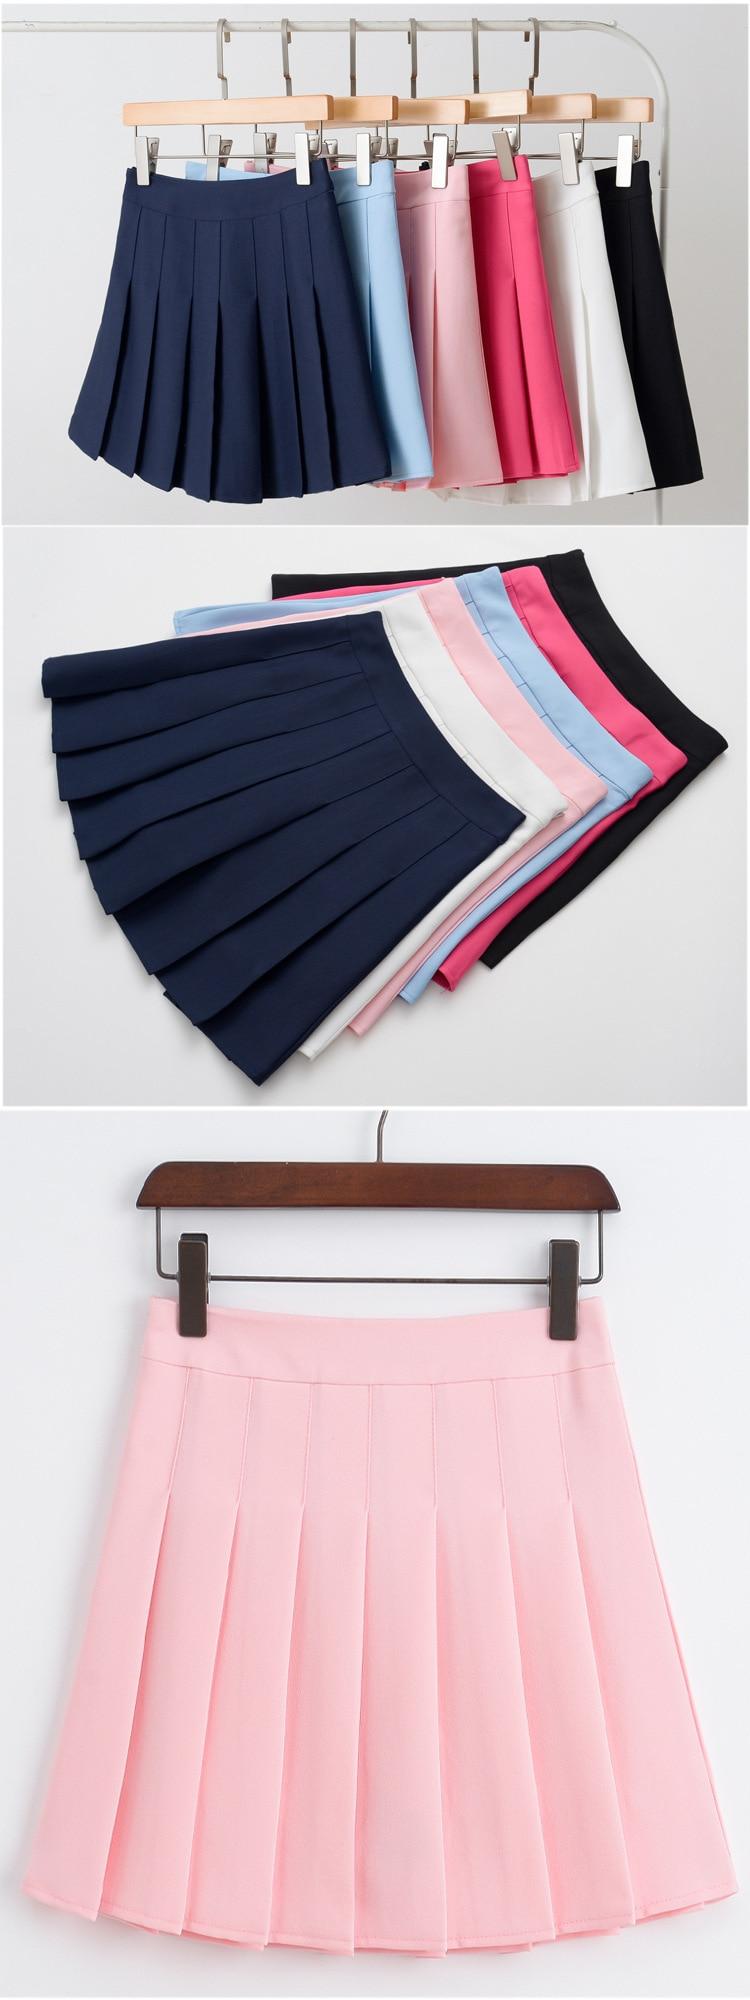 Girls A Lattice Short Dress High Waist Pleated Tennis Skirt Uniform with Inner Shorts Underpants for Badminton Cheerleader-7